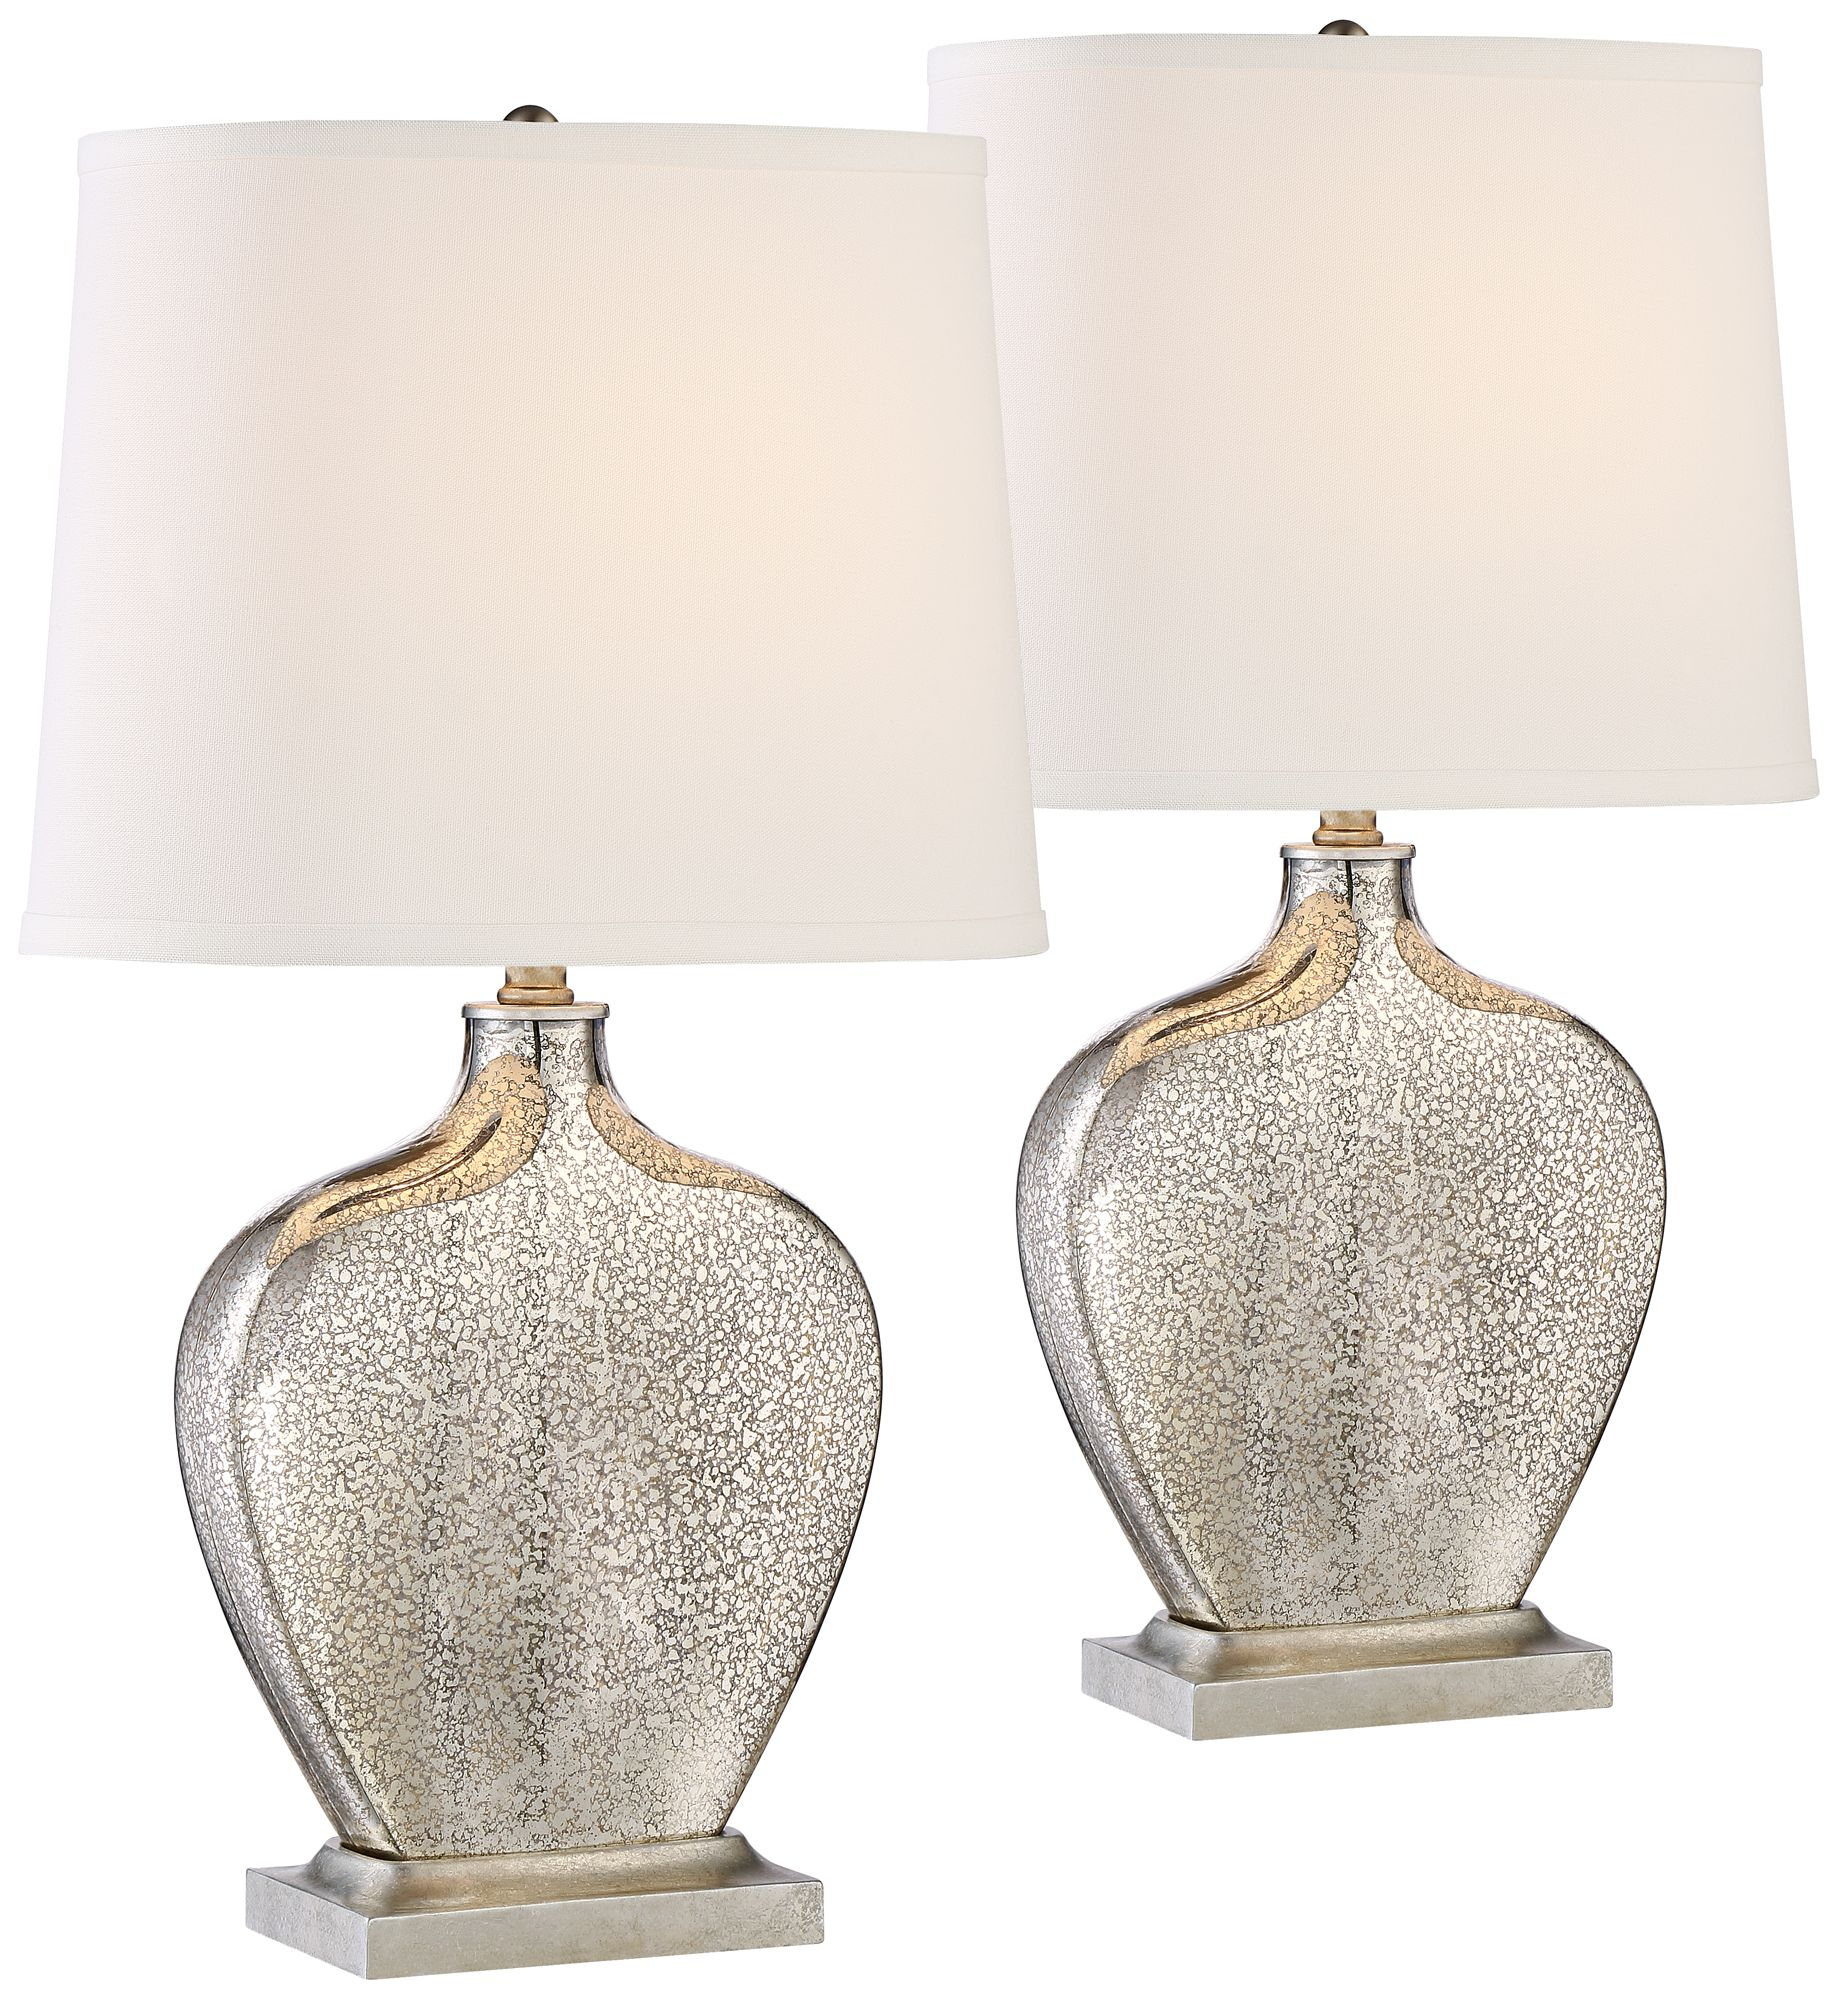 set of 2 axel mercury glass table lamps - Mercury Glass Table Lamp